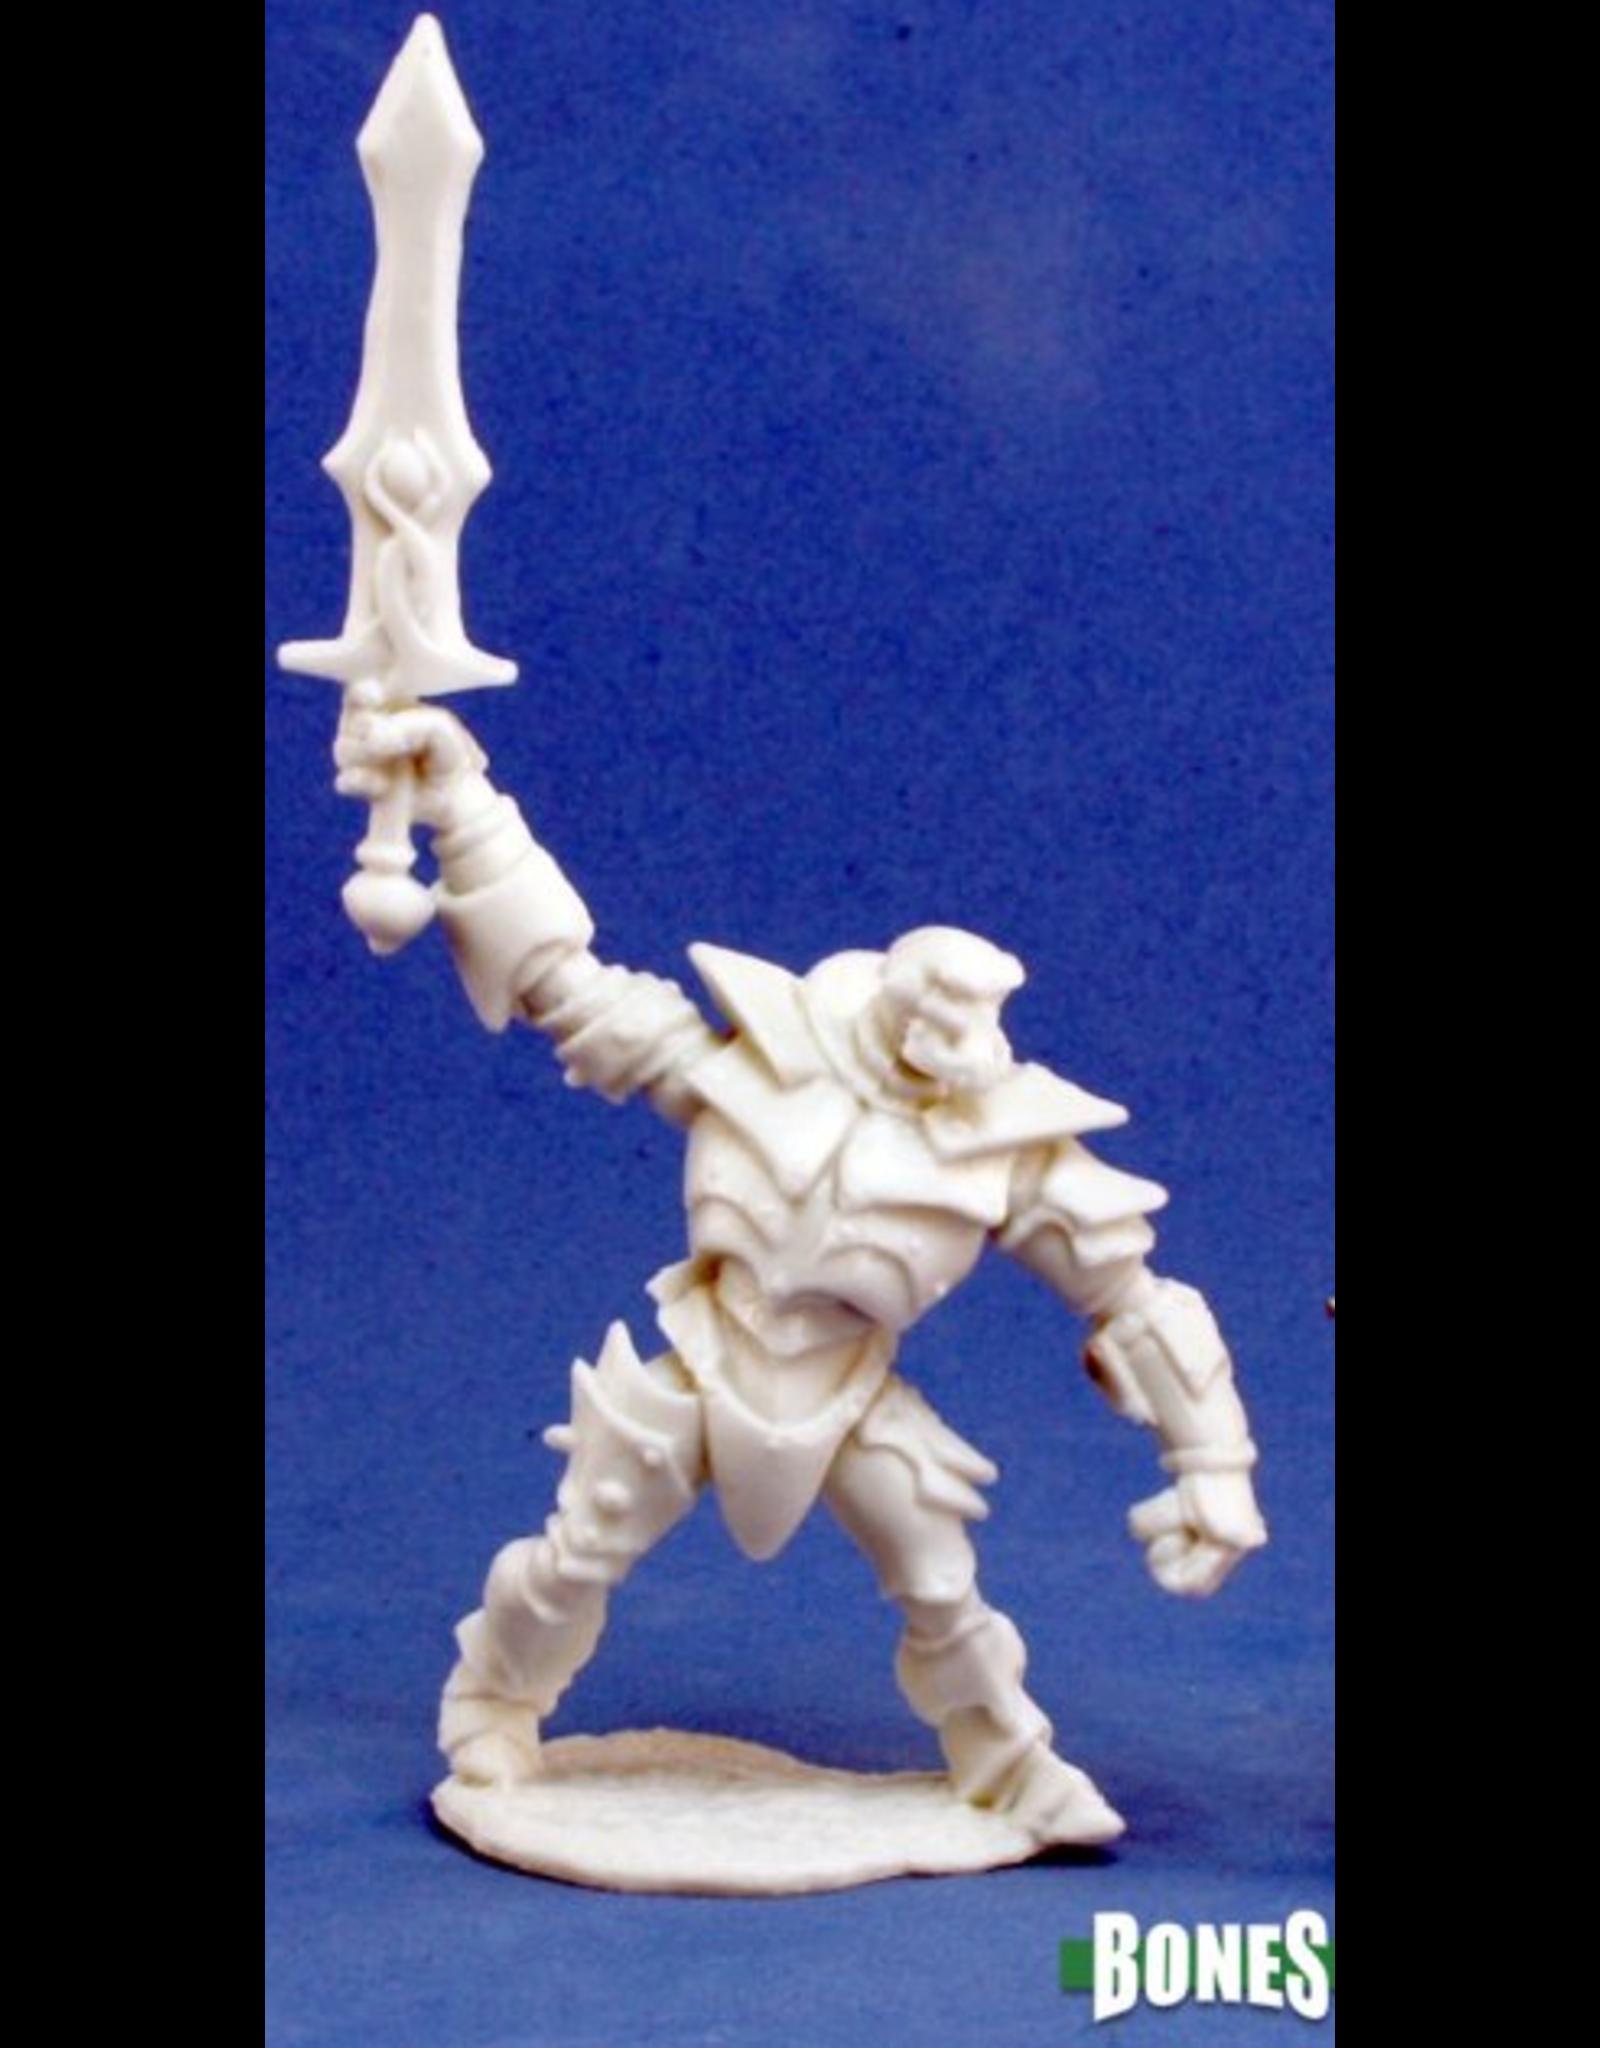 Reaper Bones: Battleguard Golem